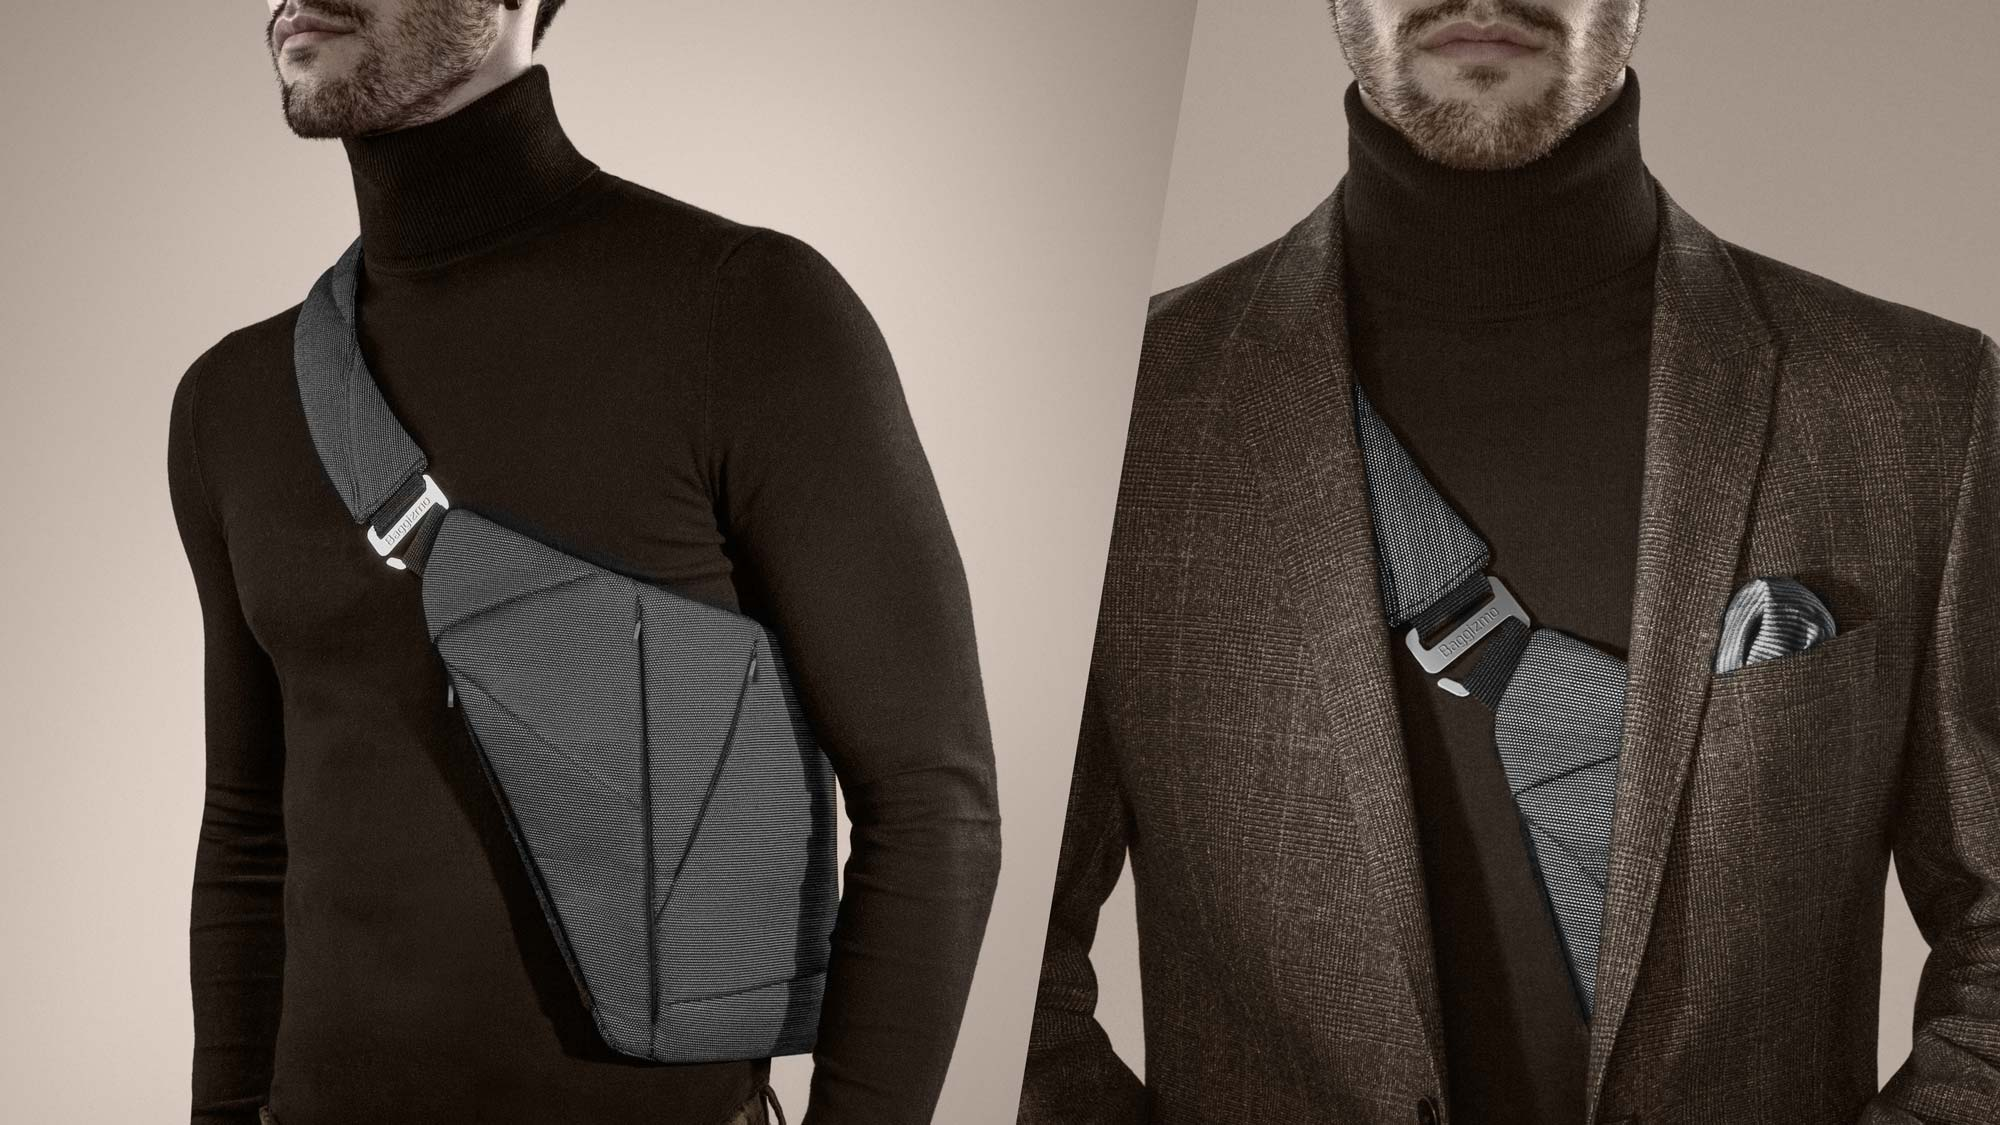 Man in turtleneck and blazer wearing grey crossbody bag for men